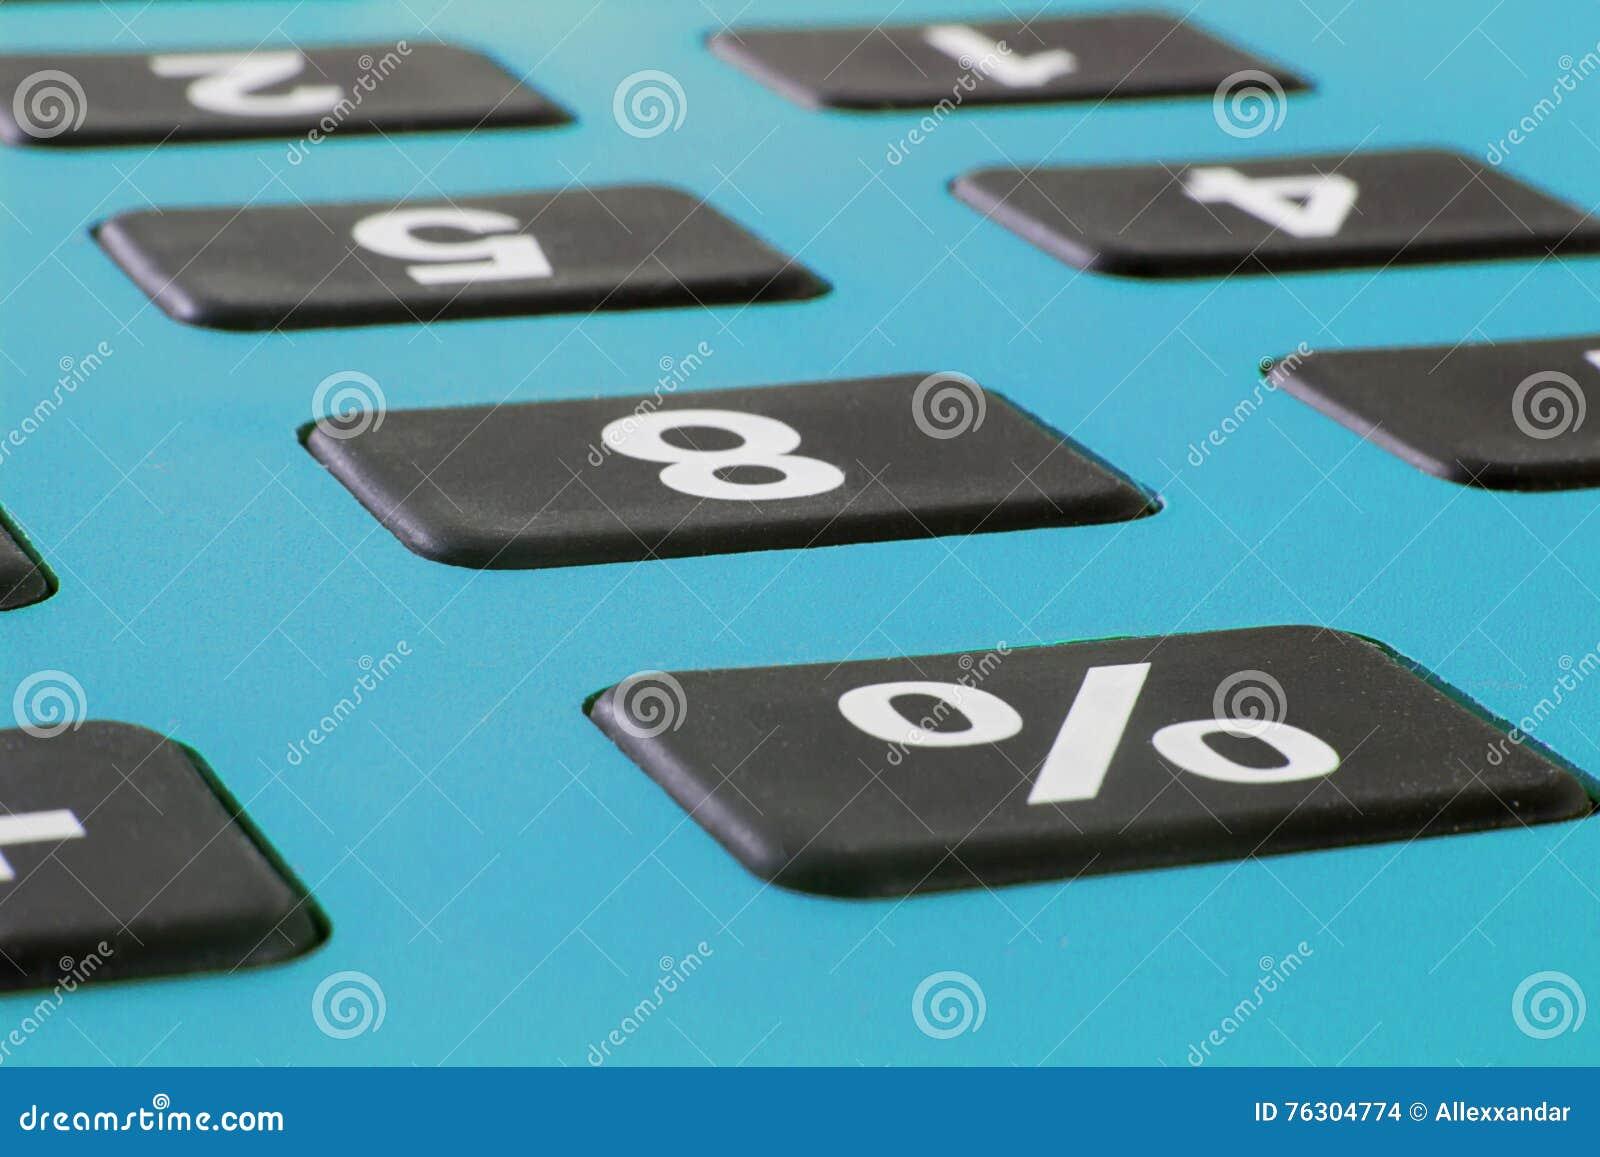 Download Close Up Macro Shot Of Calculator. Savings Calculator. Finance Calculator. Economy And Home Concept. Credit Card Calculator. Credi Stock Photo - Image of credit, depth: 76304774